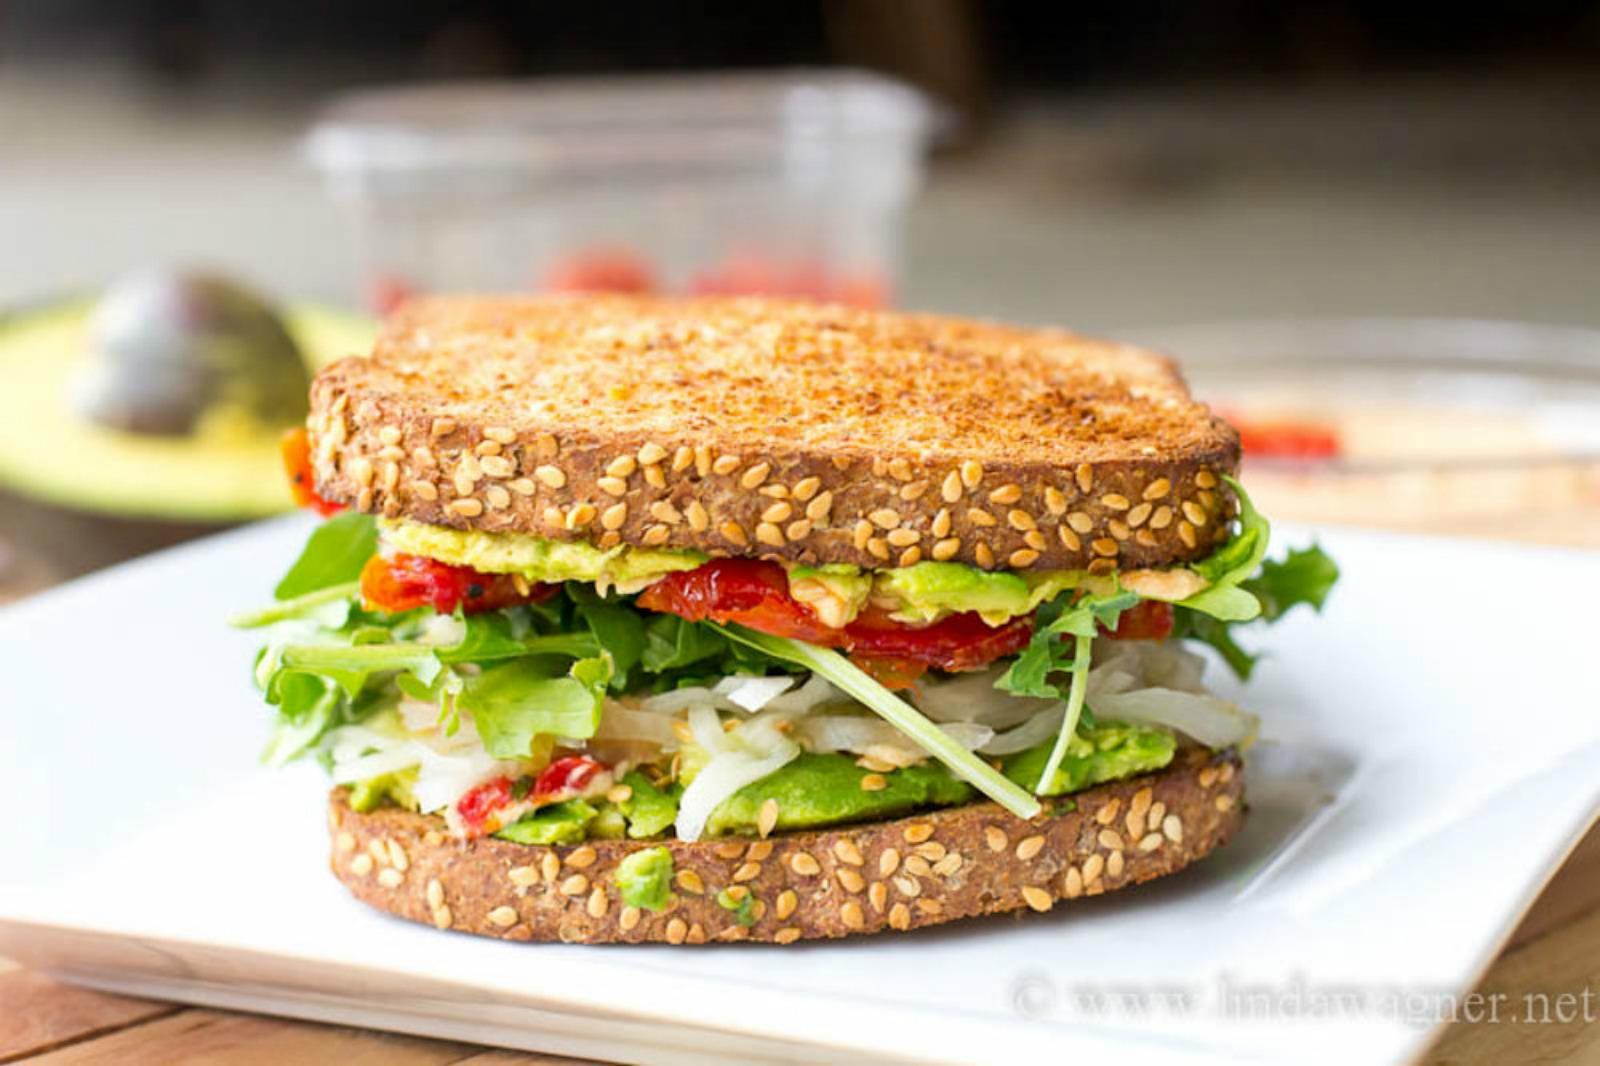 5 Oil-Free Vegan Mayo Sandwich Options